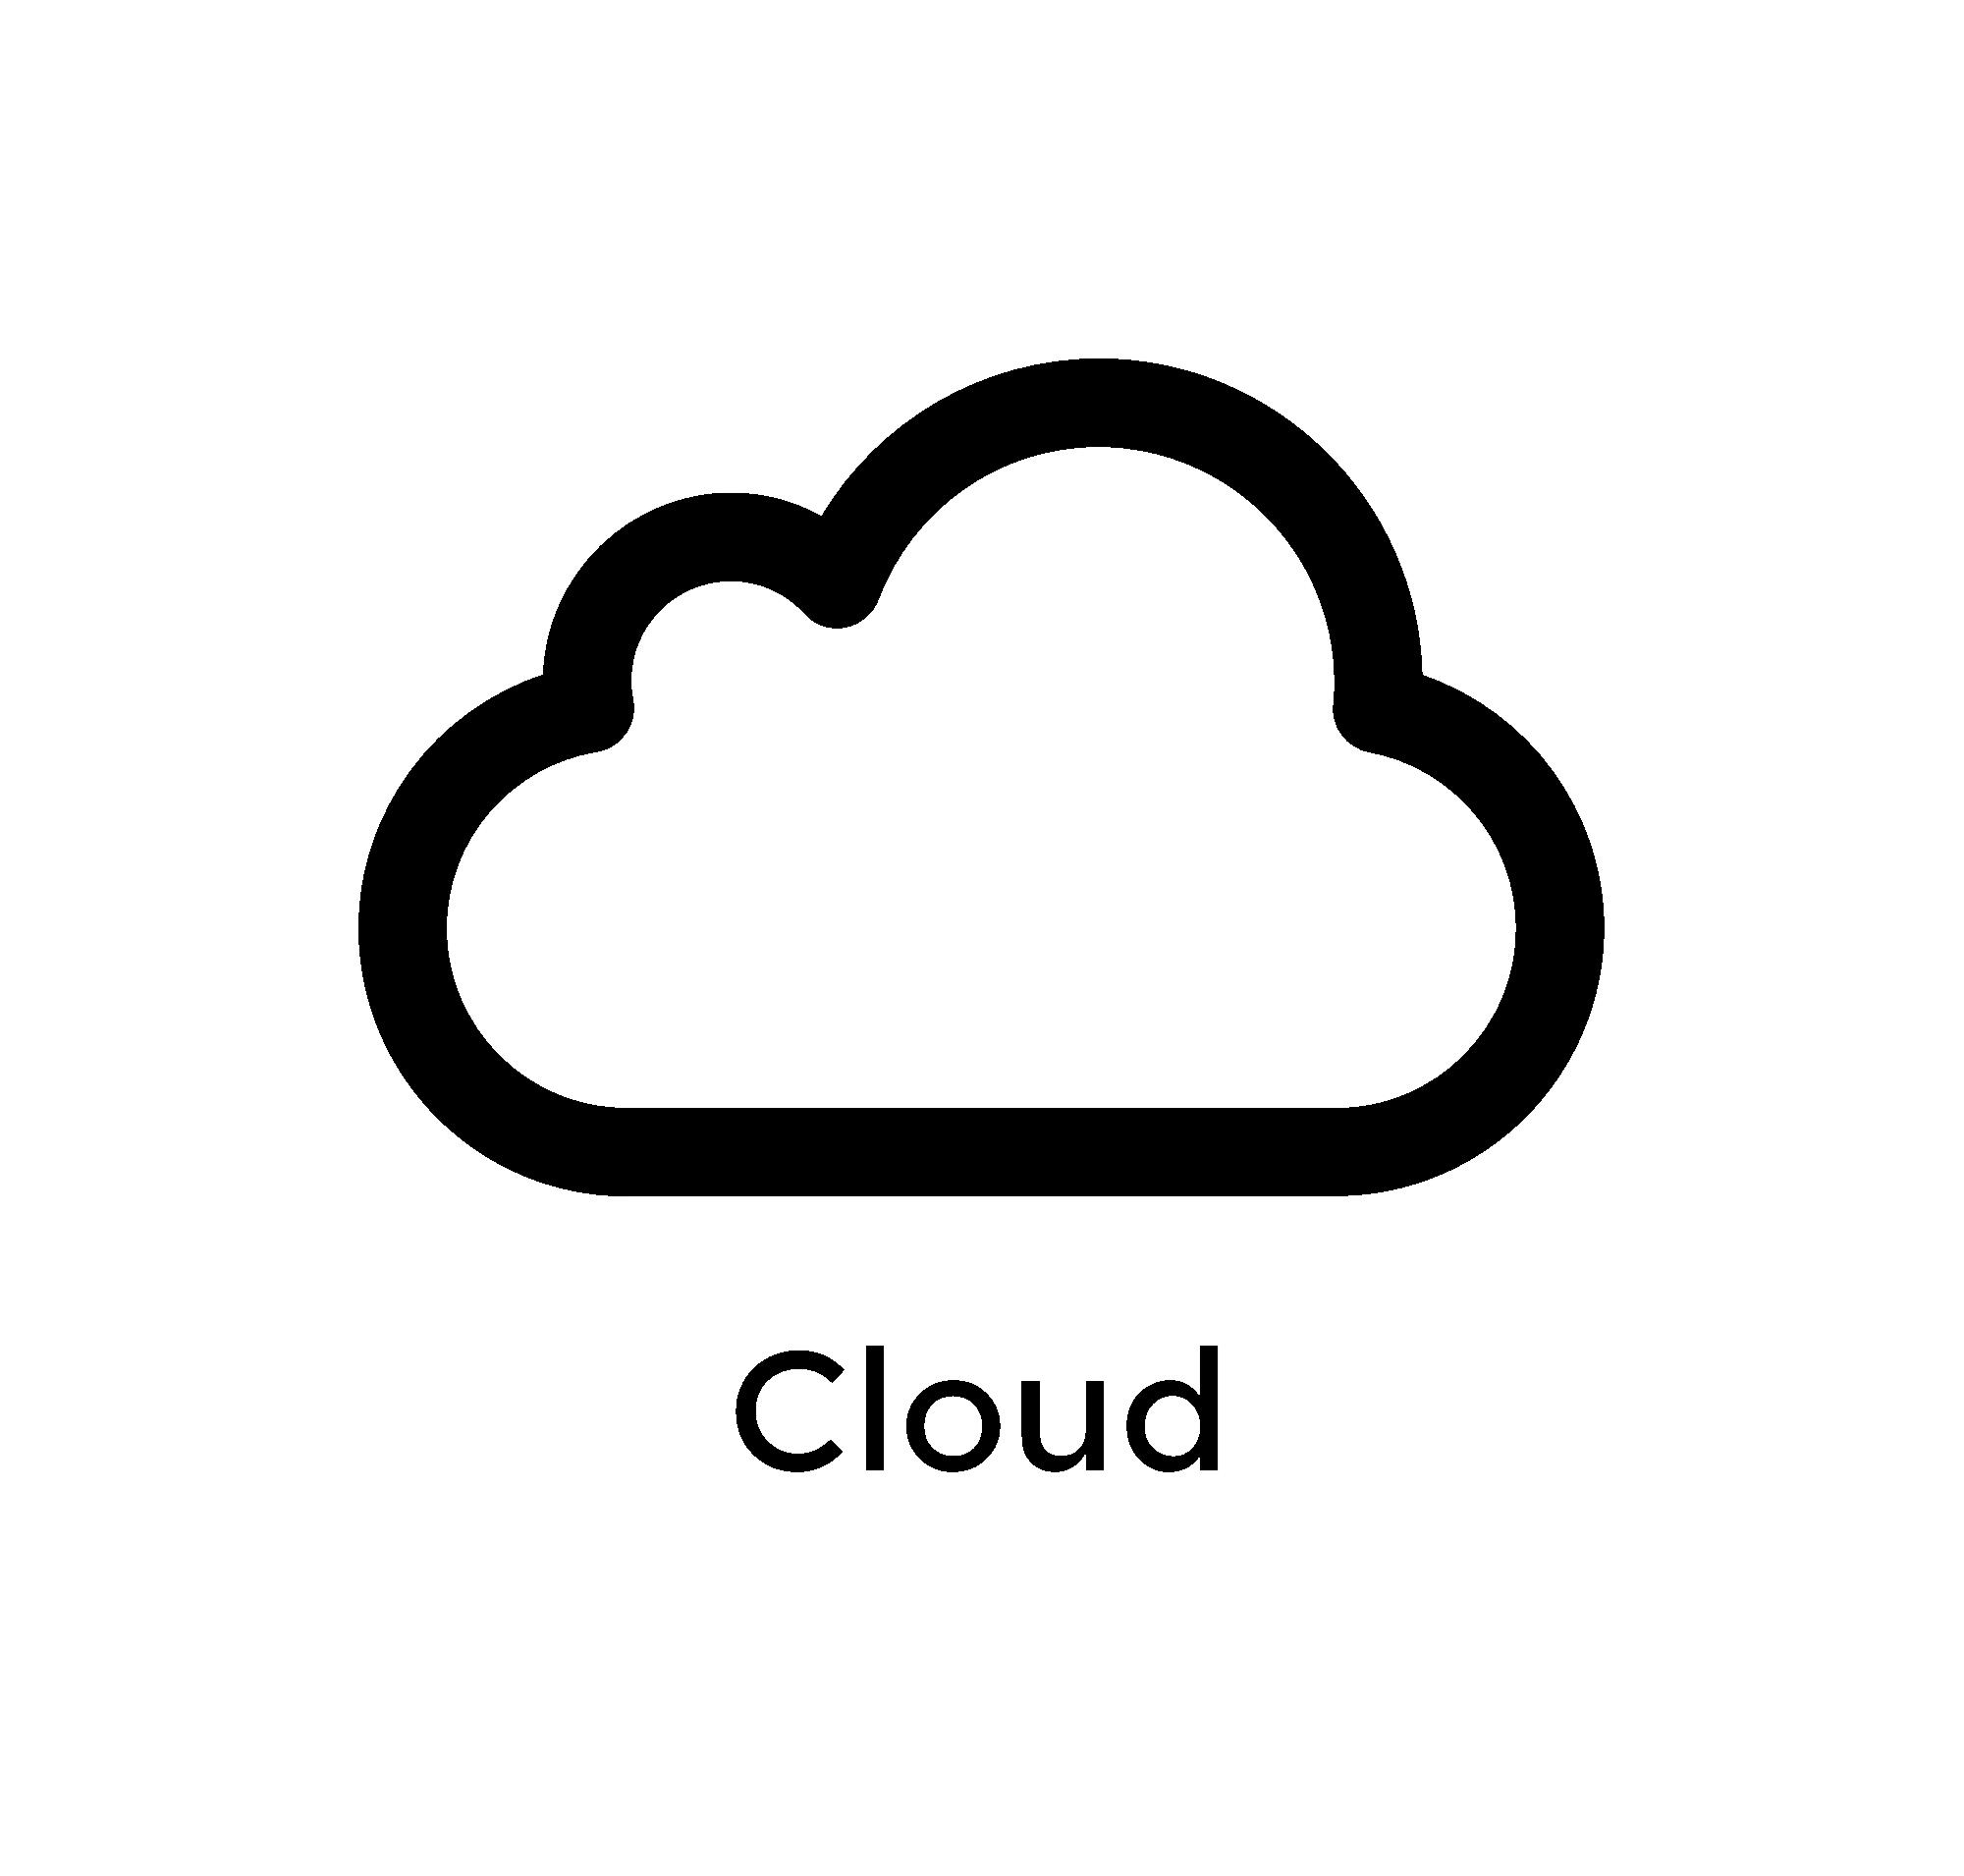 Cloud-logo black (2).png